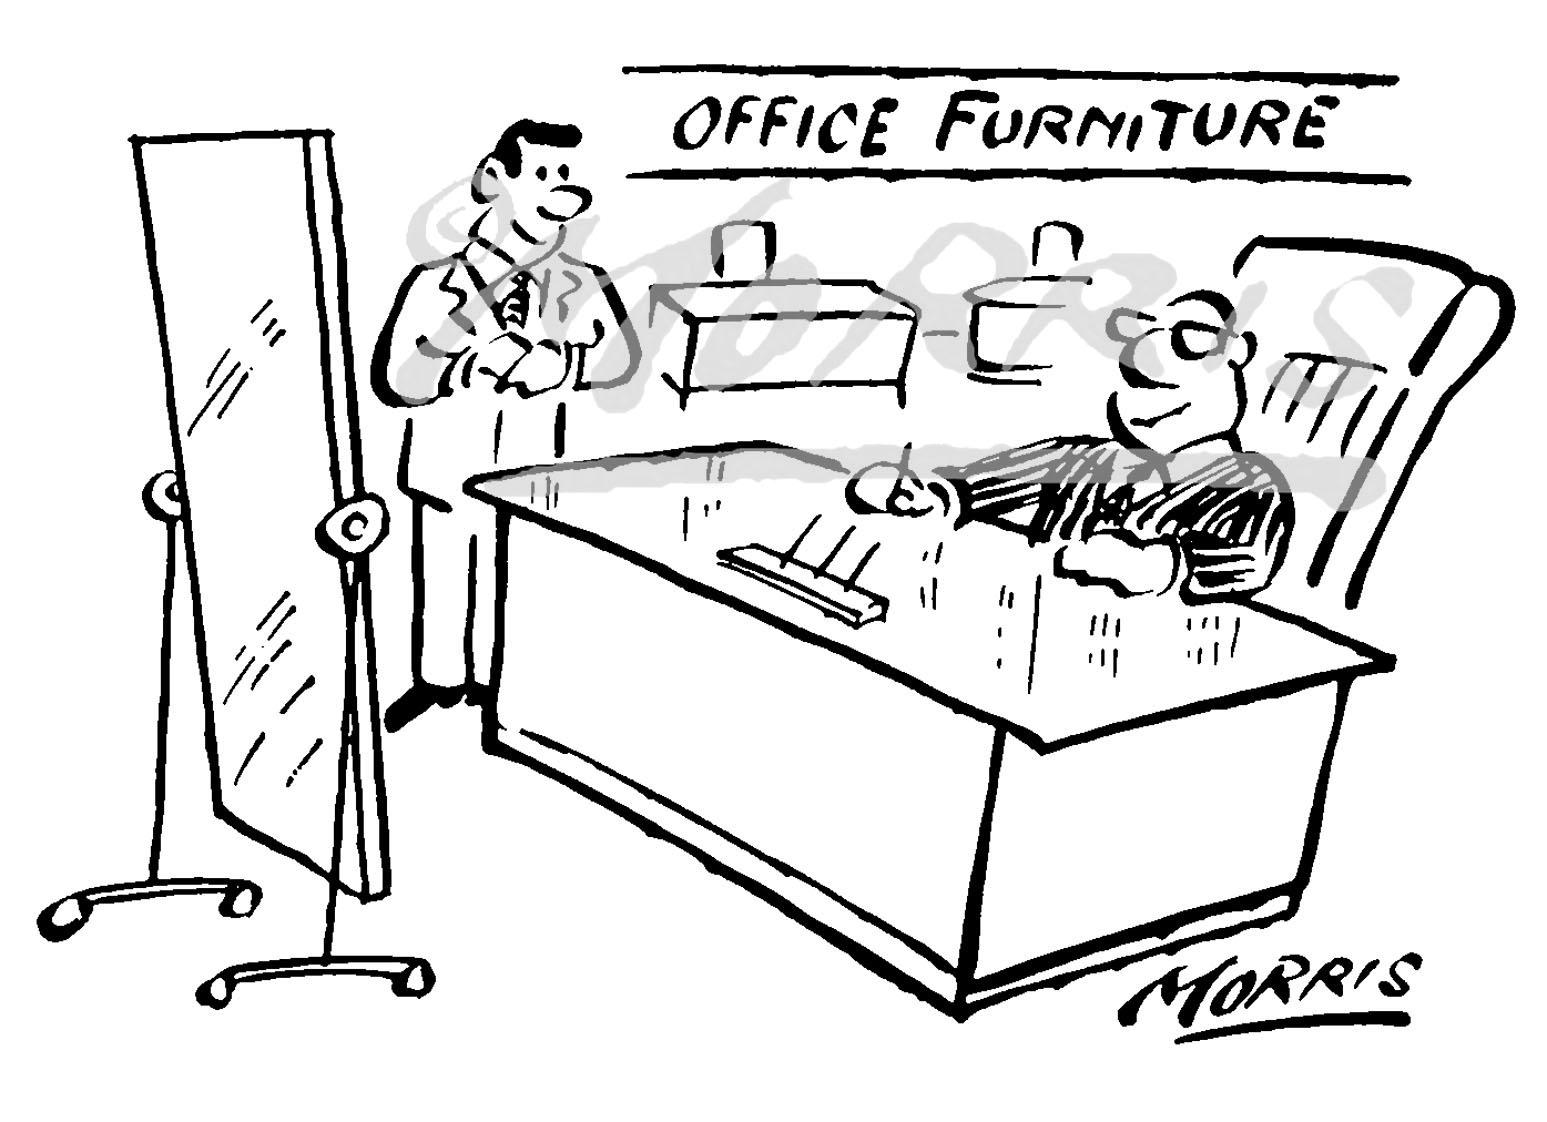 Office furniture cartoon Ref: 1620bw